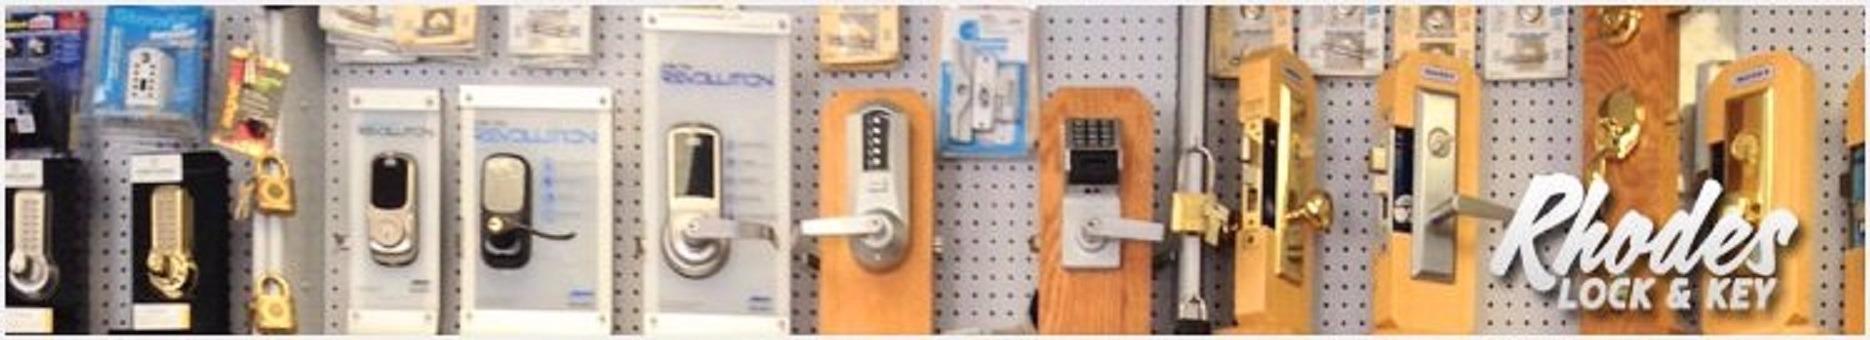 Rhodes Lock Amp Key Coupons Near Me In Baldwin 8coupons